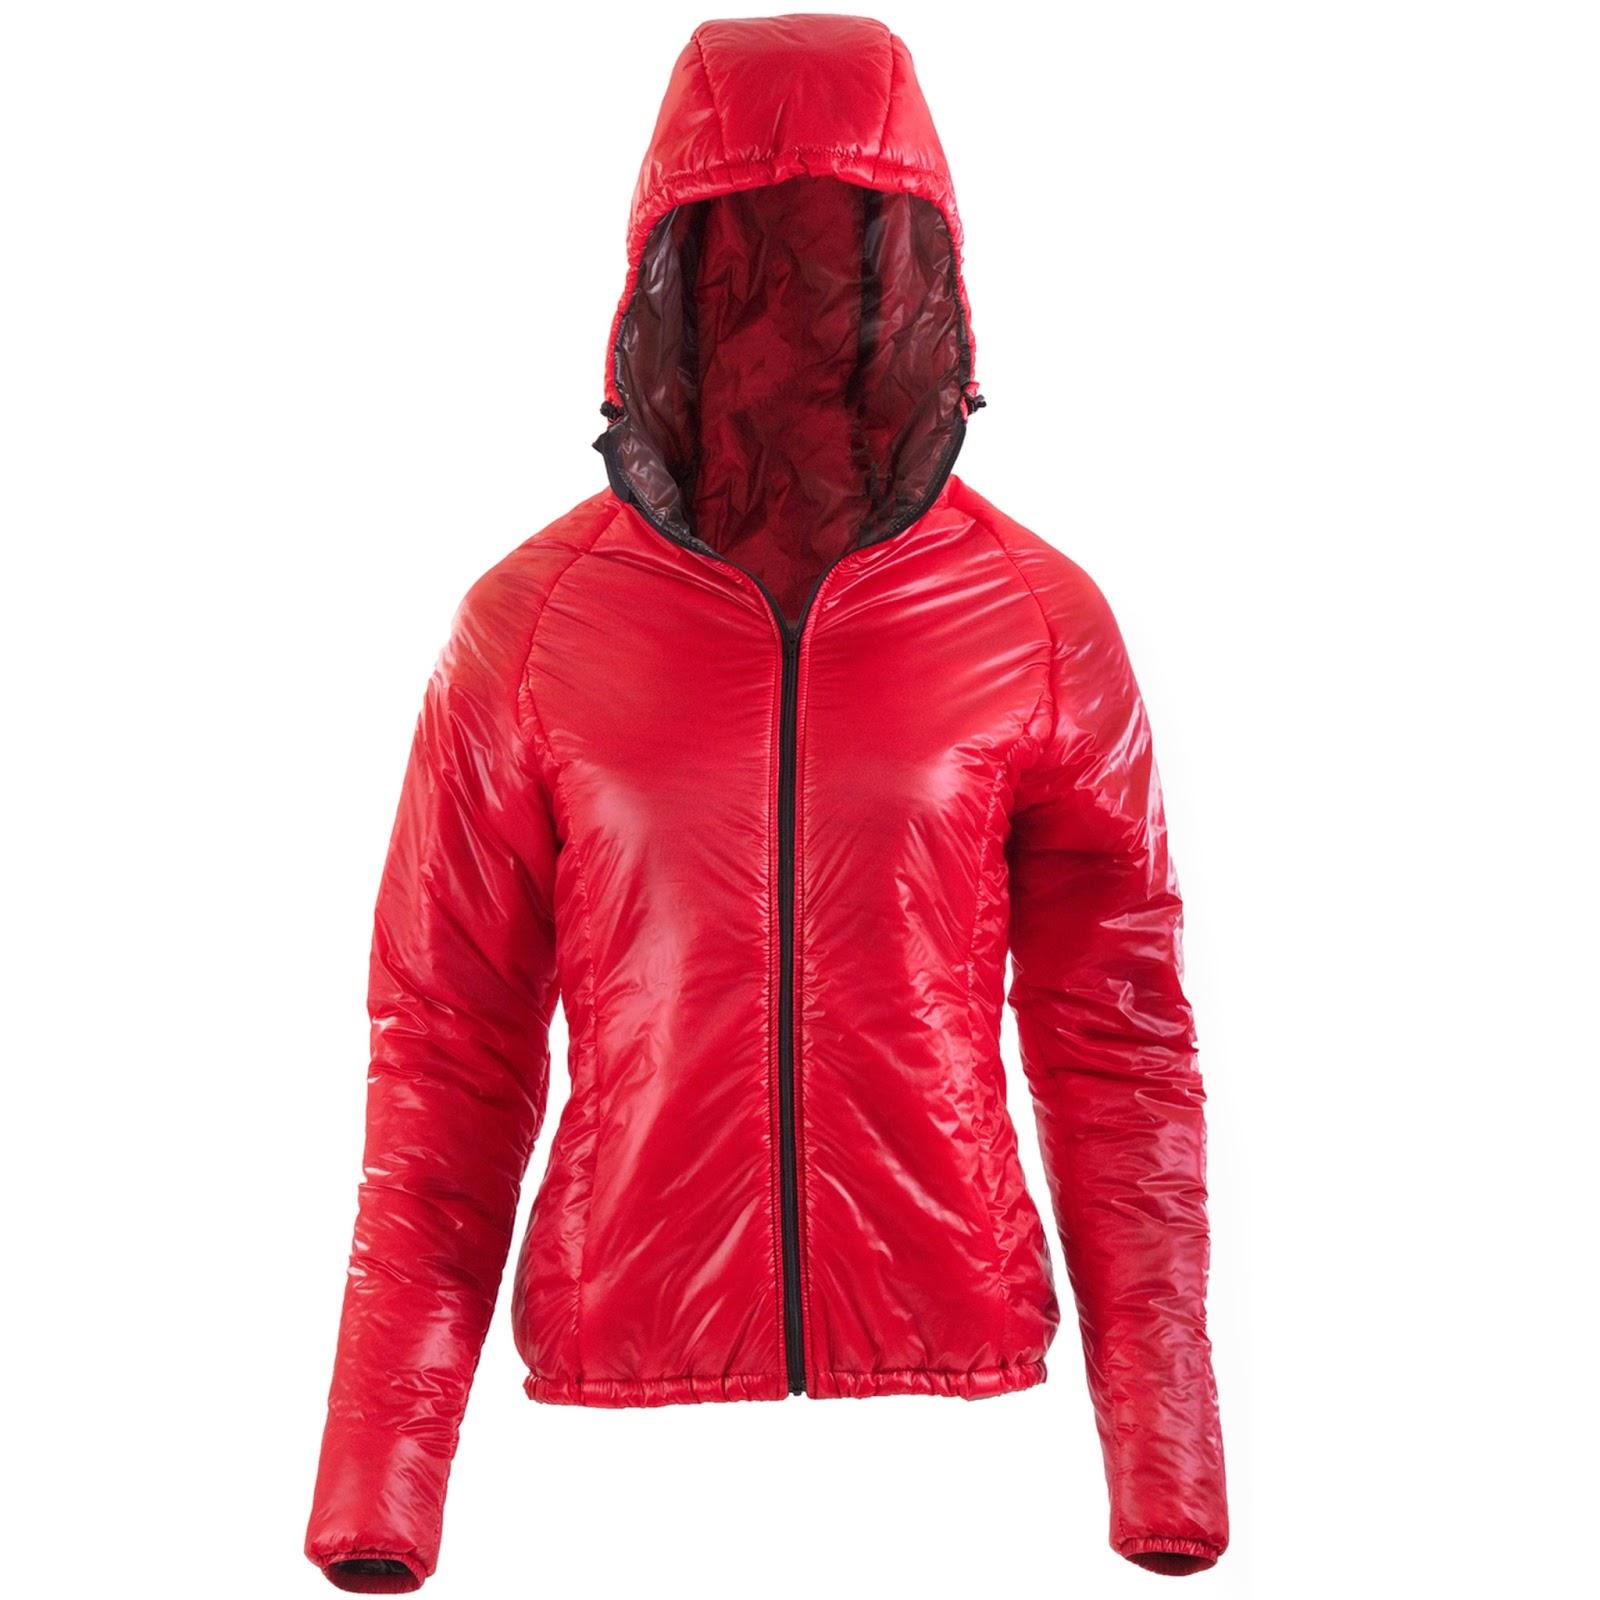 enlightened equipment torrid apex jacket 2